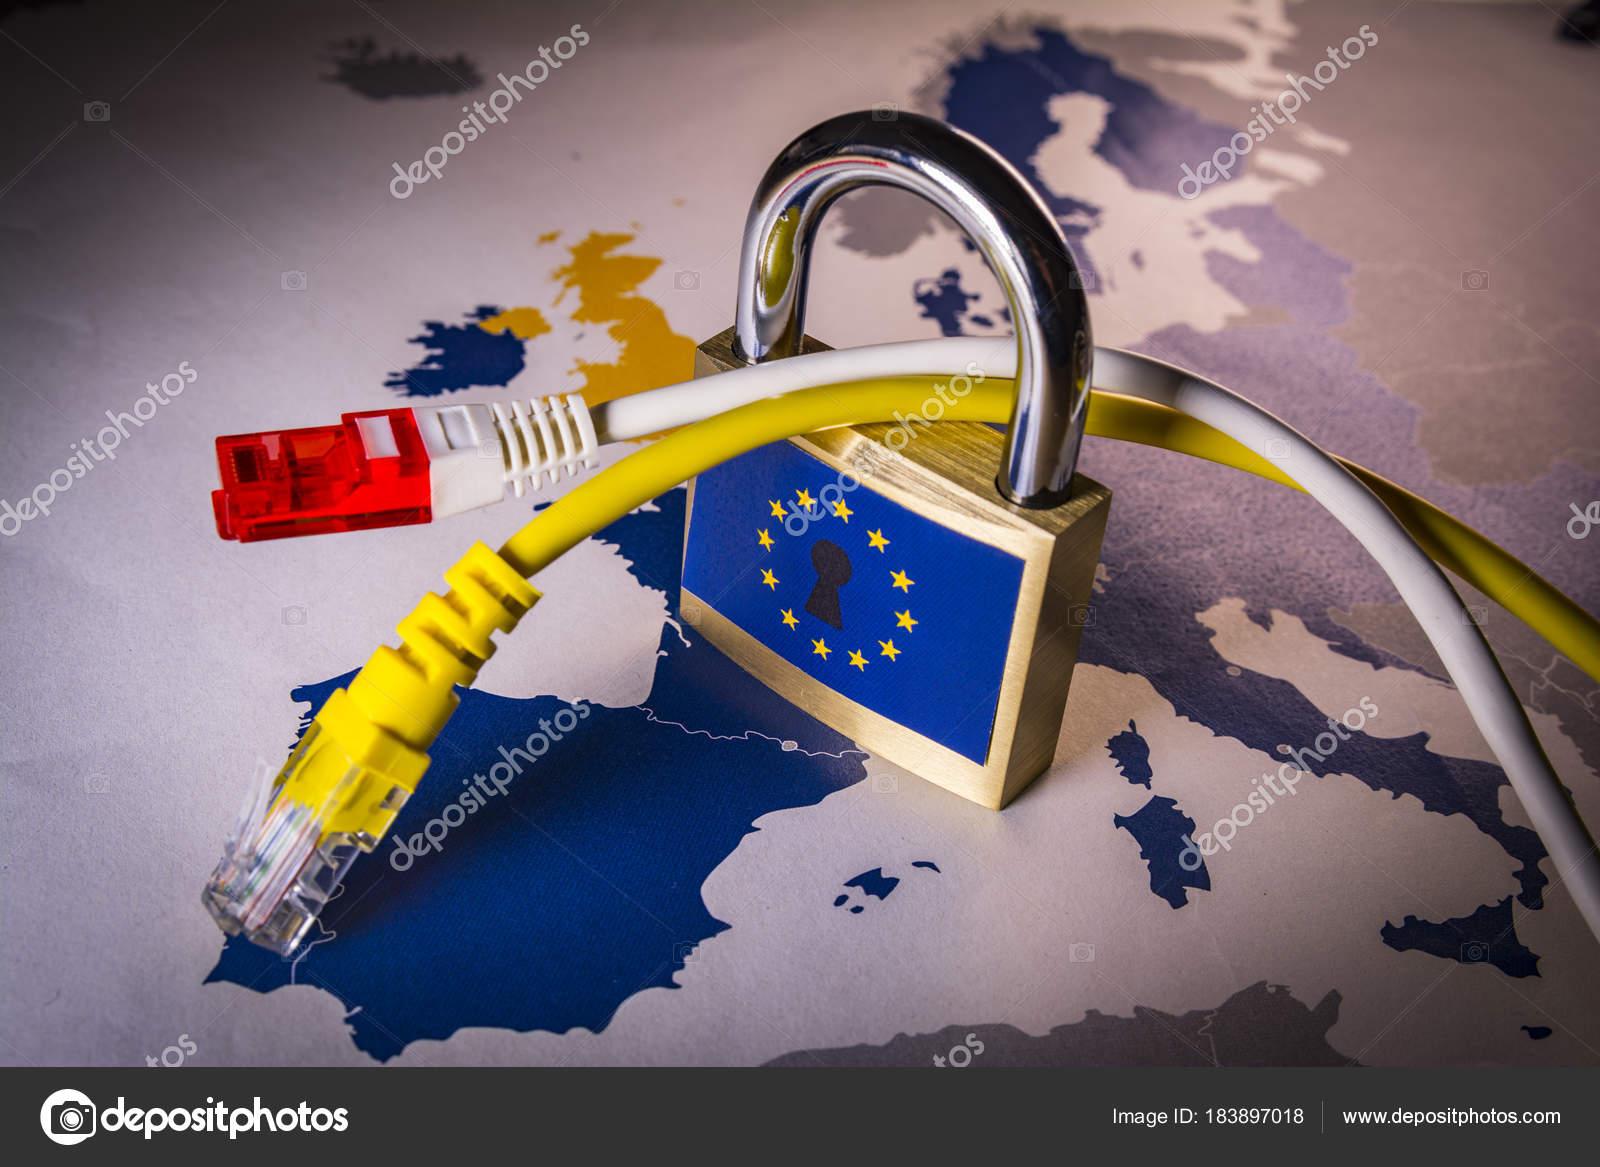 Über EU-Karte, DSGVO Metapher Vorhängeschloss — Stockfoto © tbtb ...